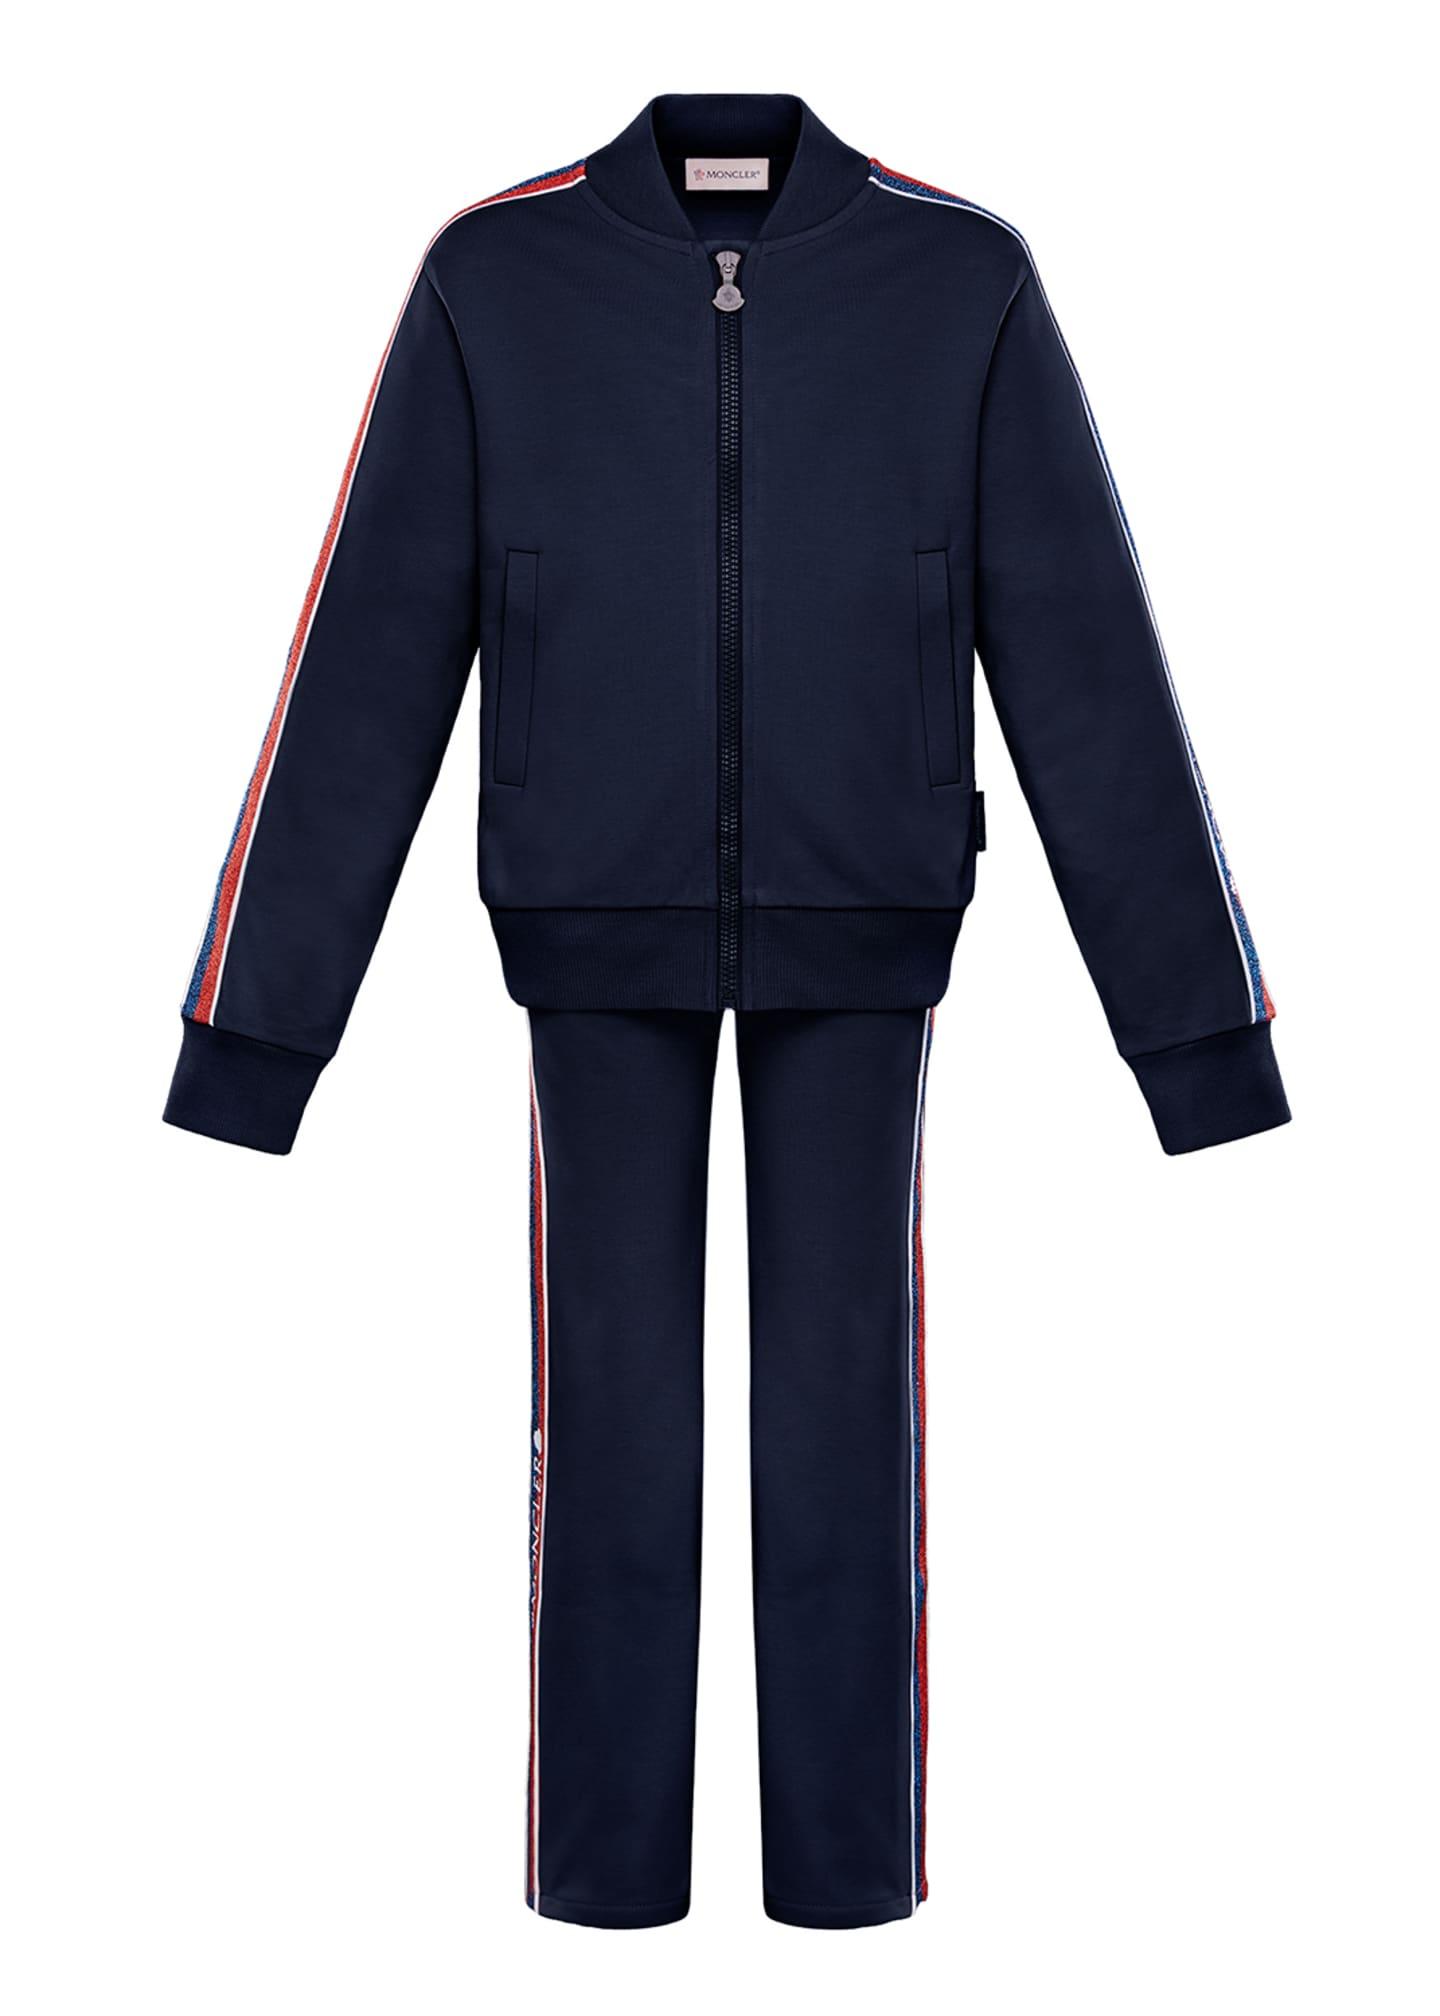 Moncler Glitter Striped-Trim Jacket w/ Matching Pants, Size